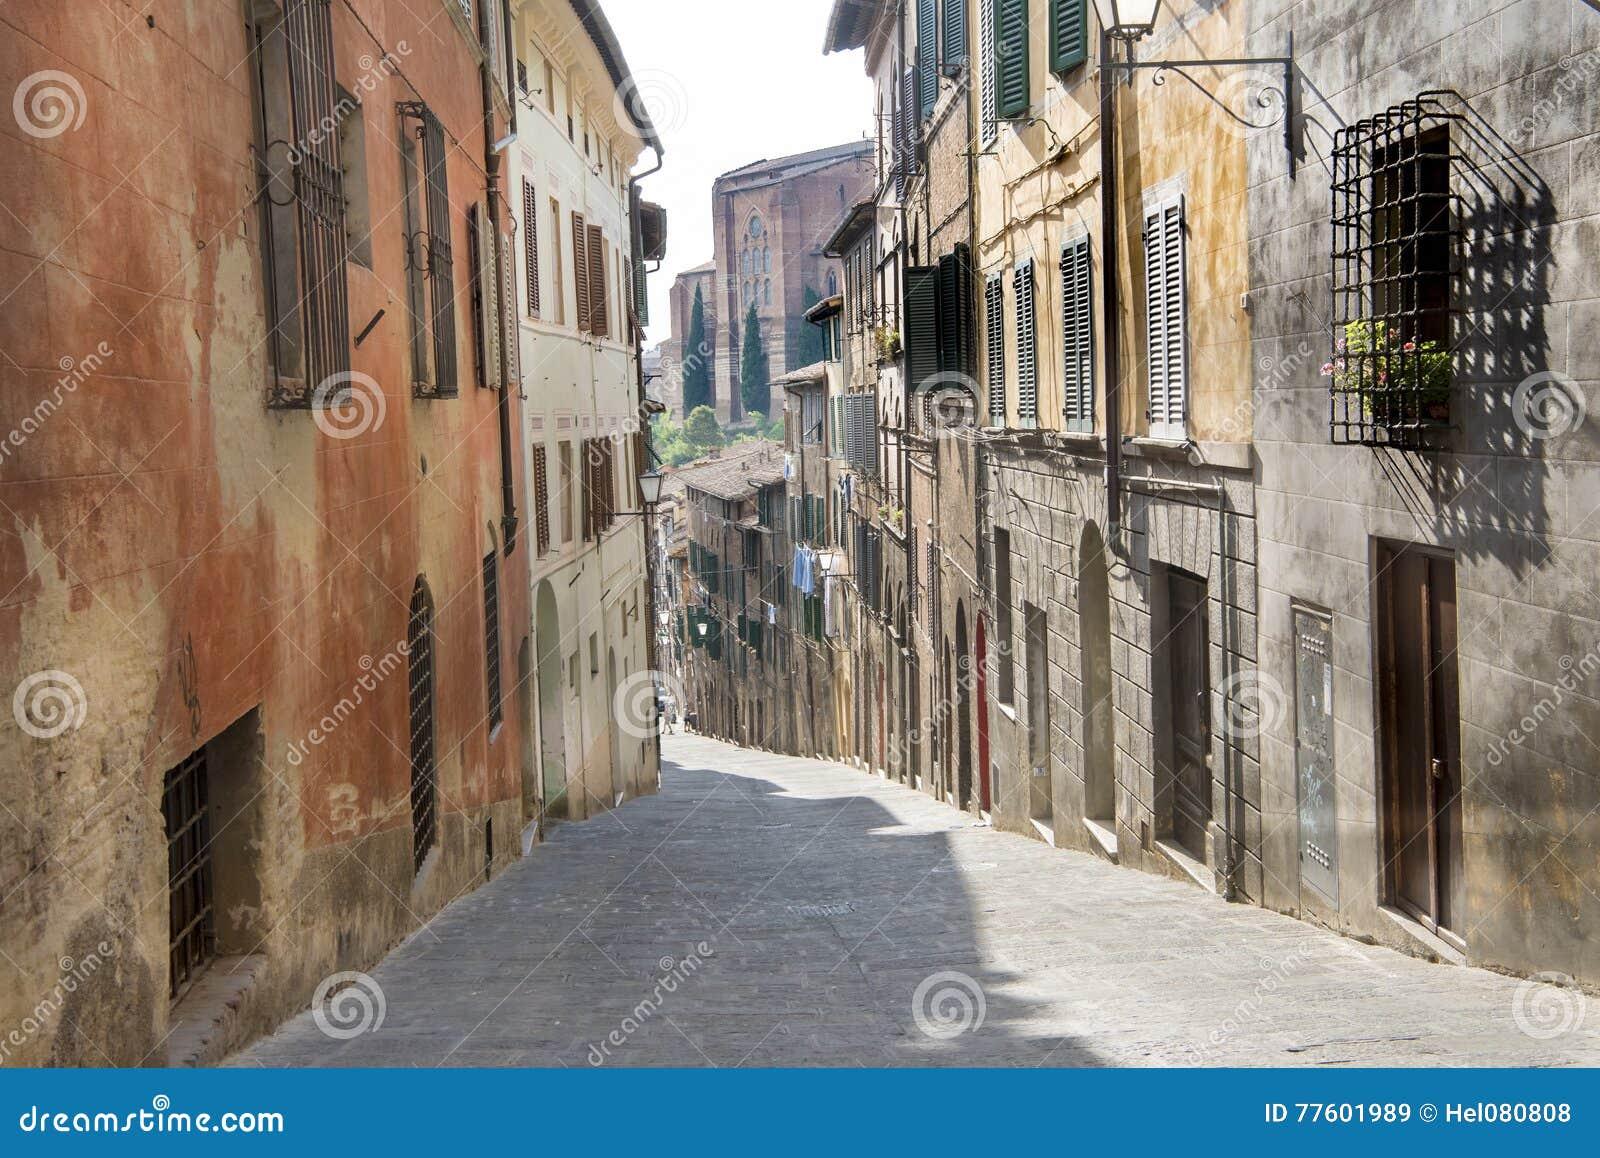 Small street in Siena, Italy